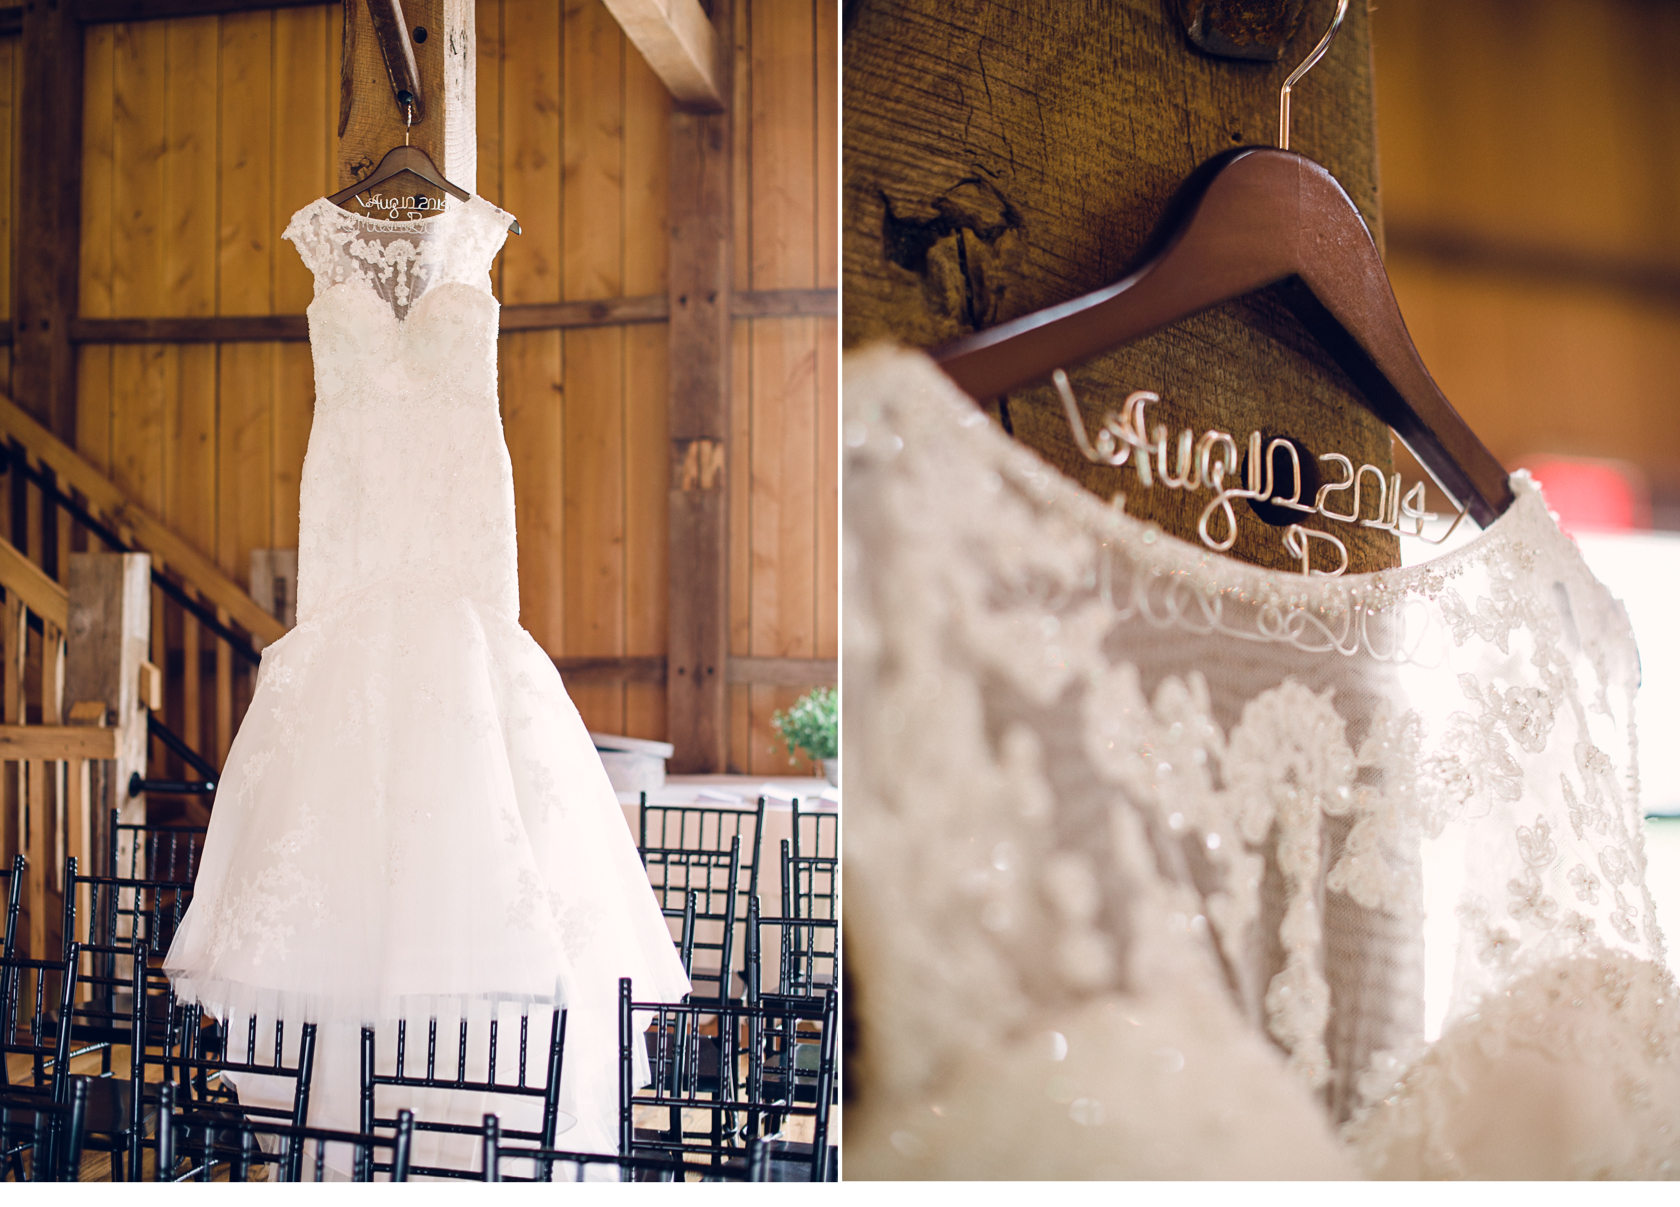 Wedding Dress in Barn